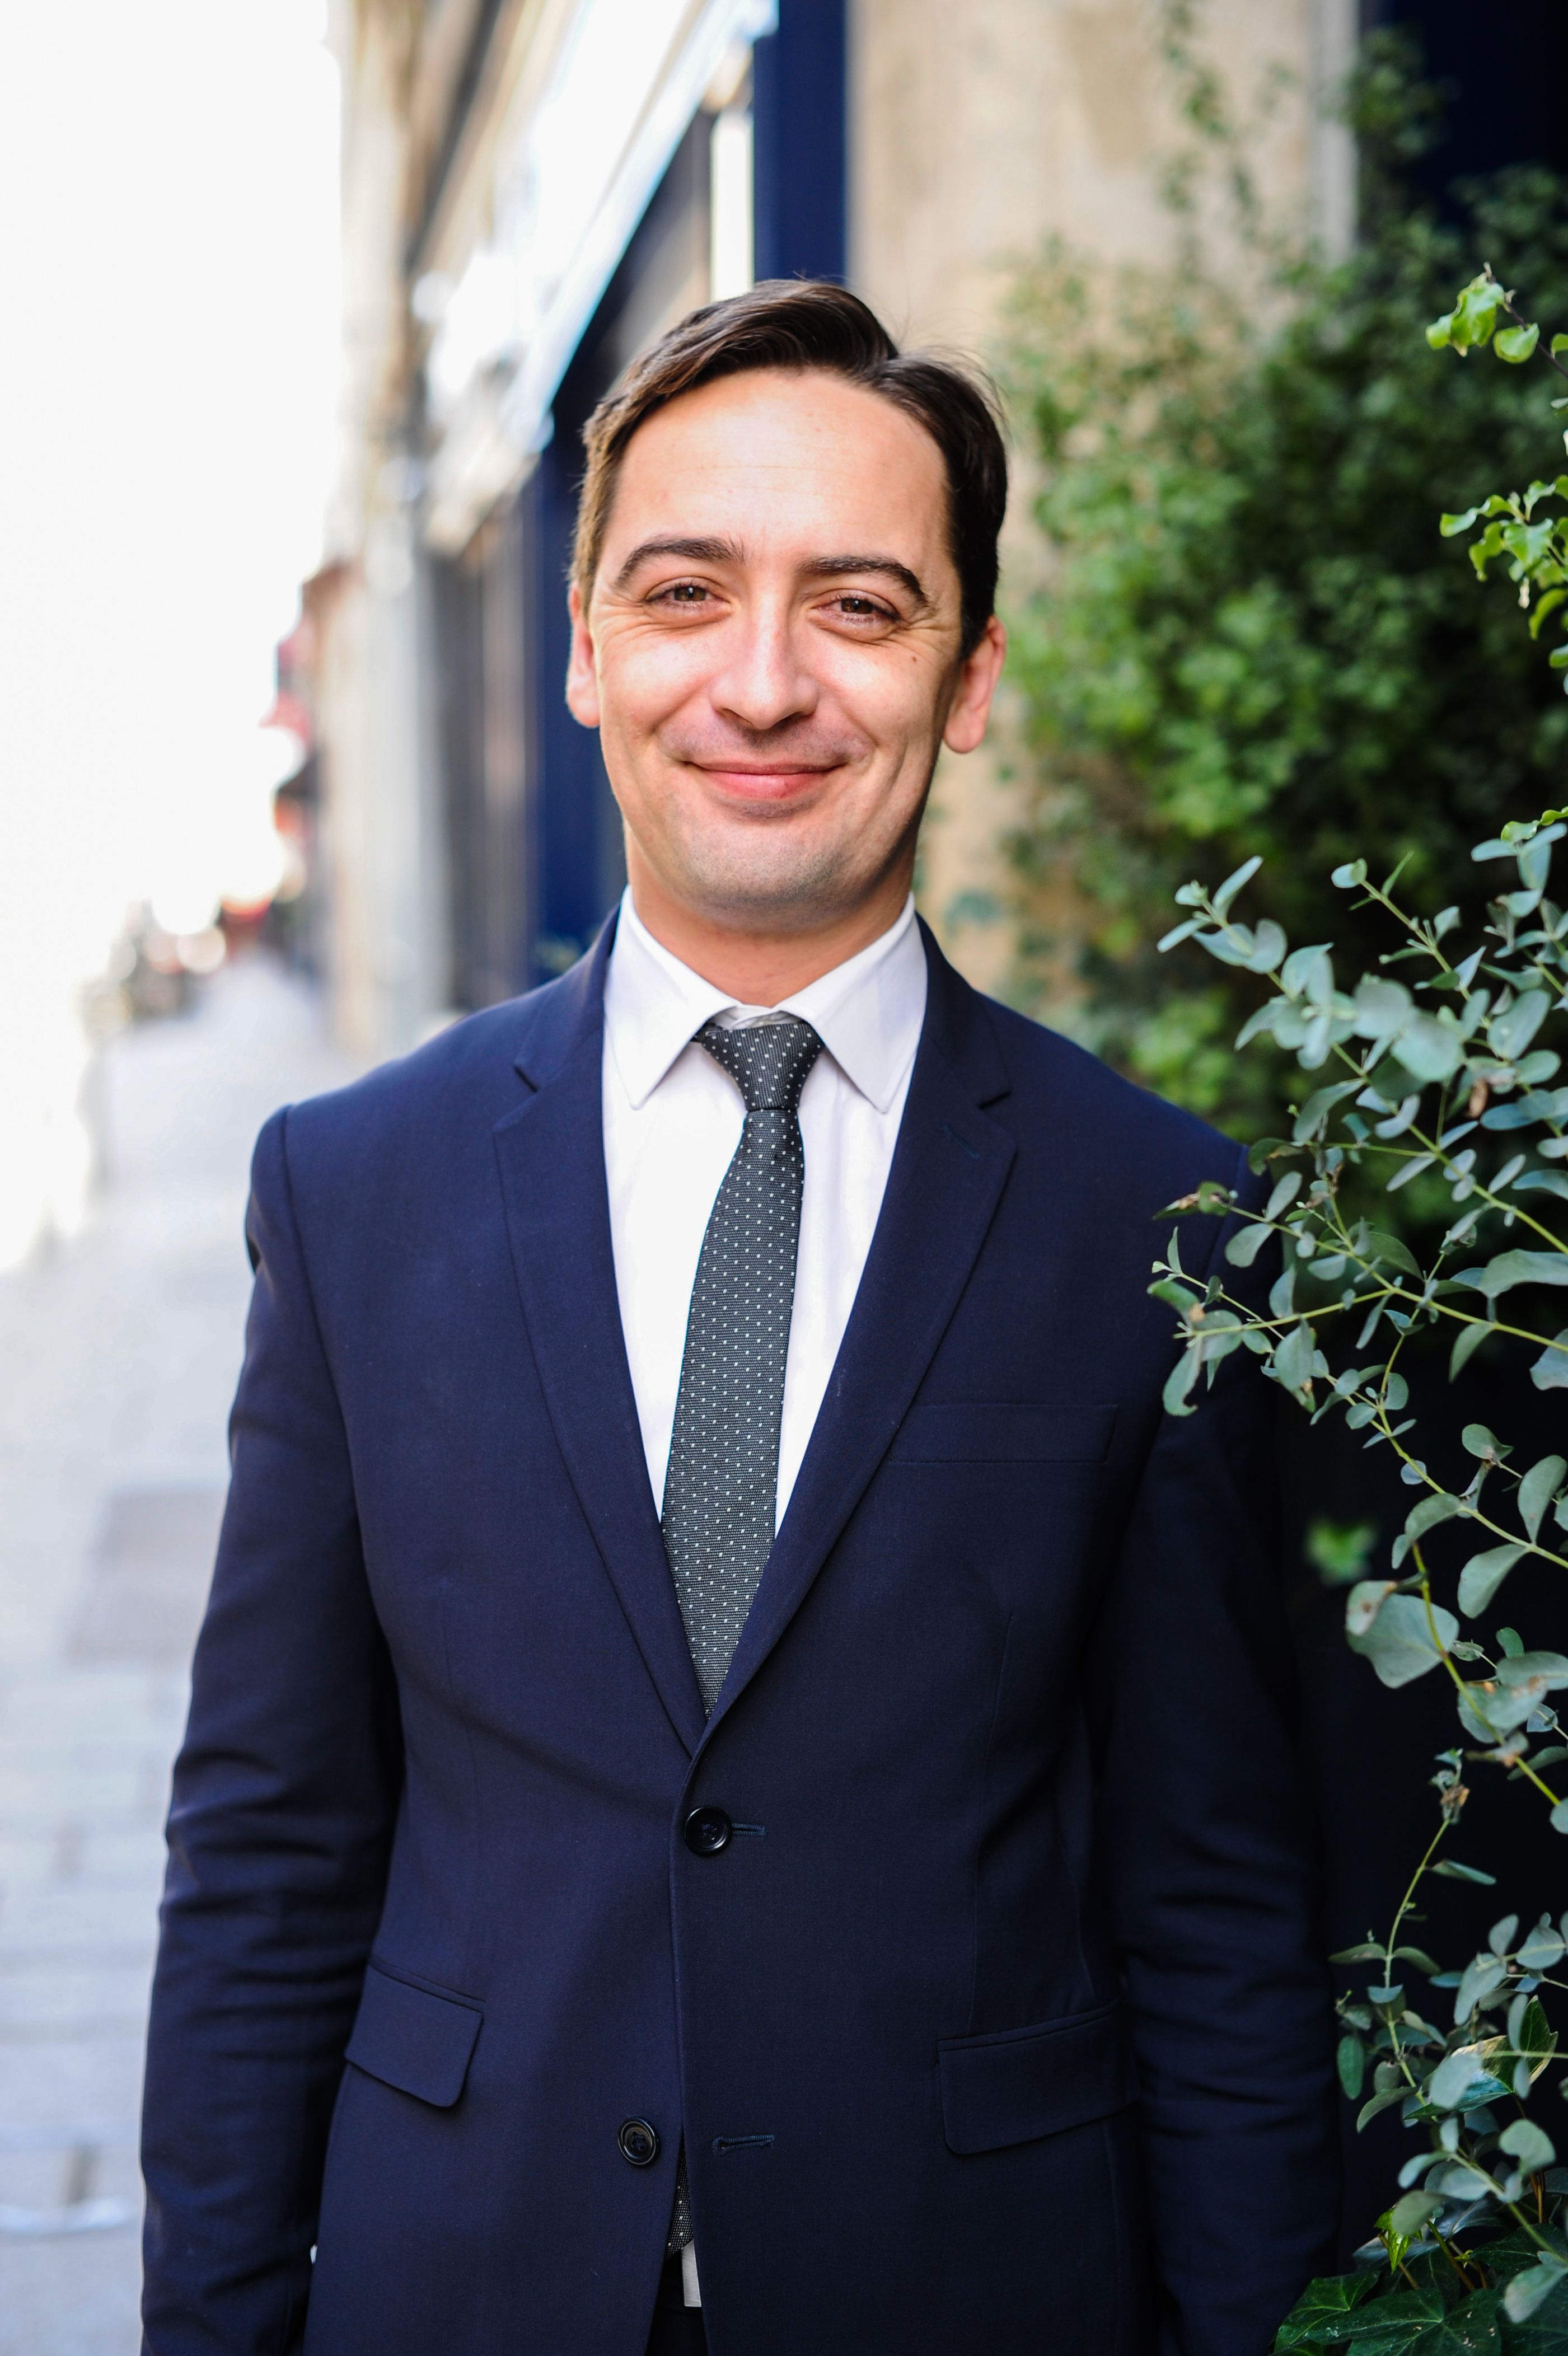 Maxime Gomes Saltao